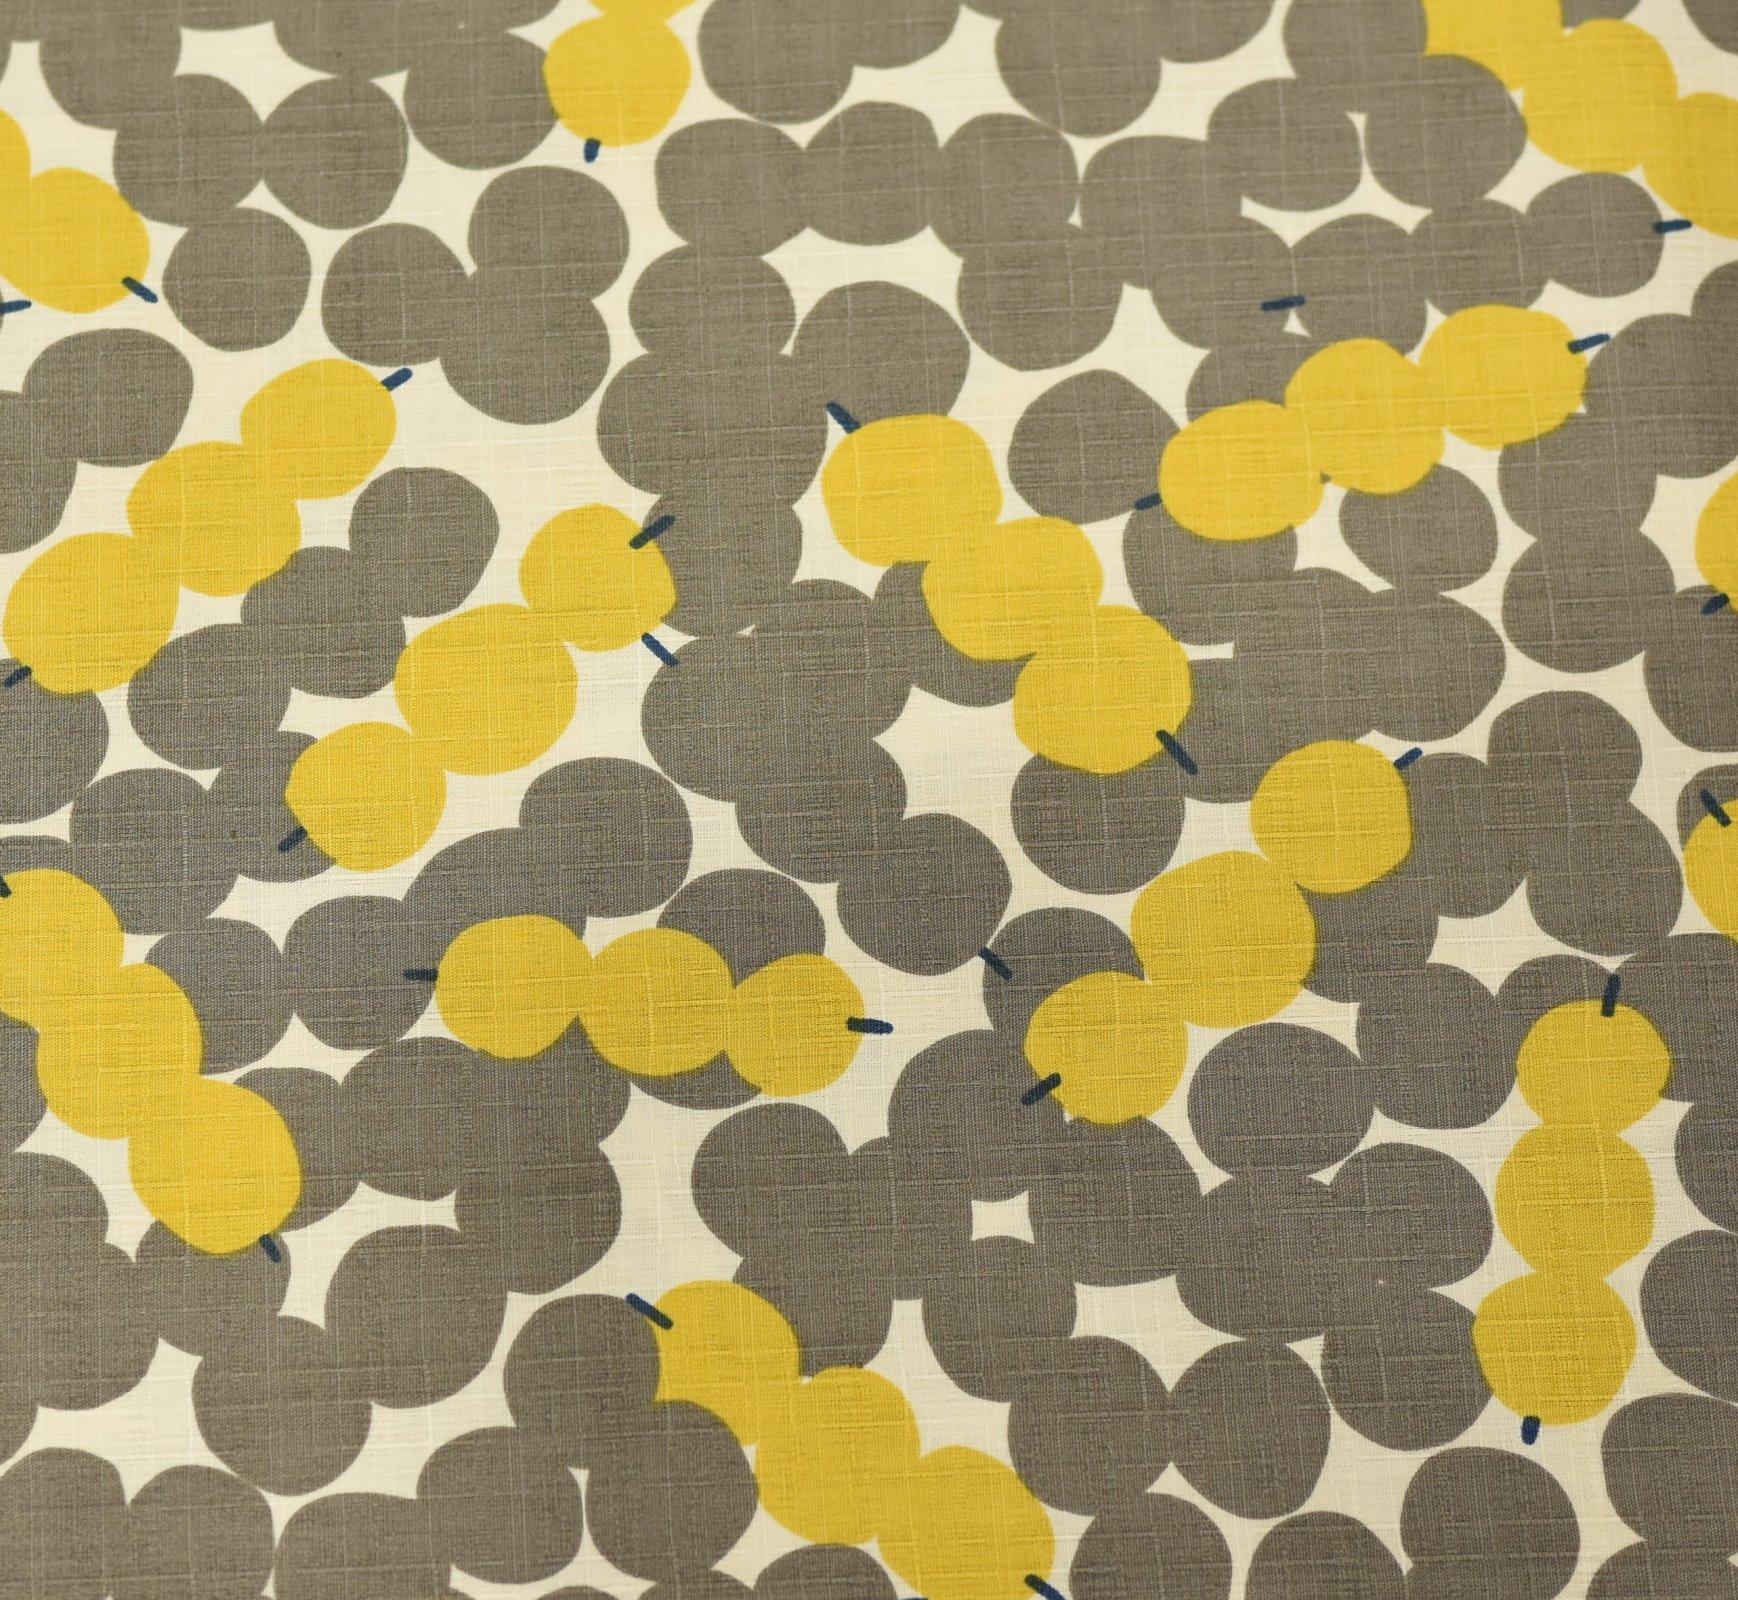 Hokkoh Fabric - Skewered Spots Grey